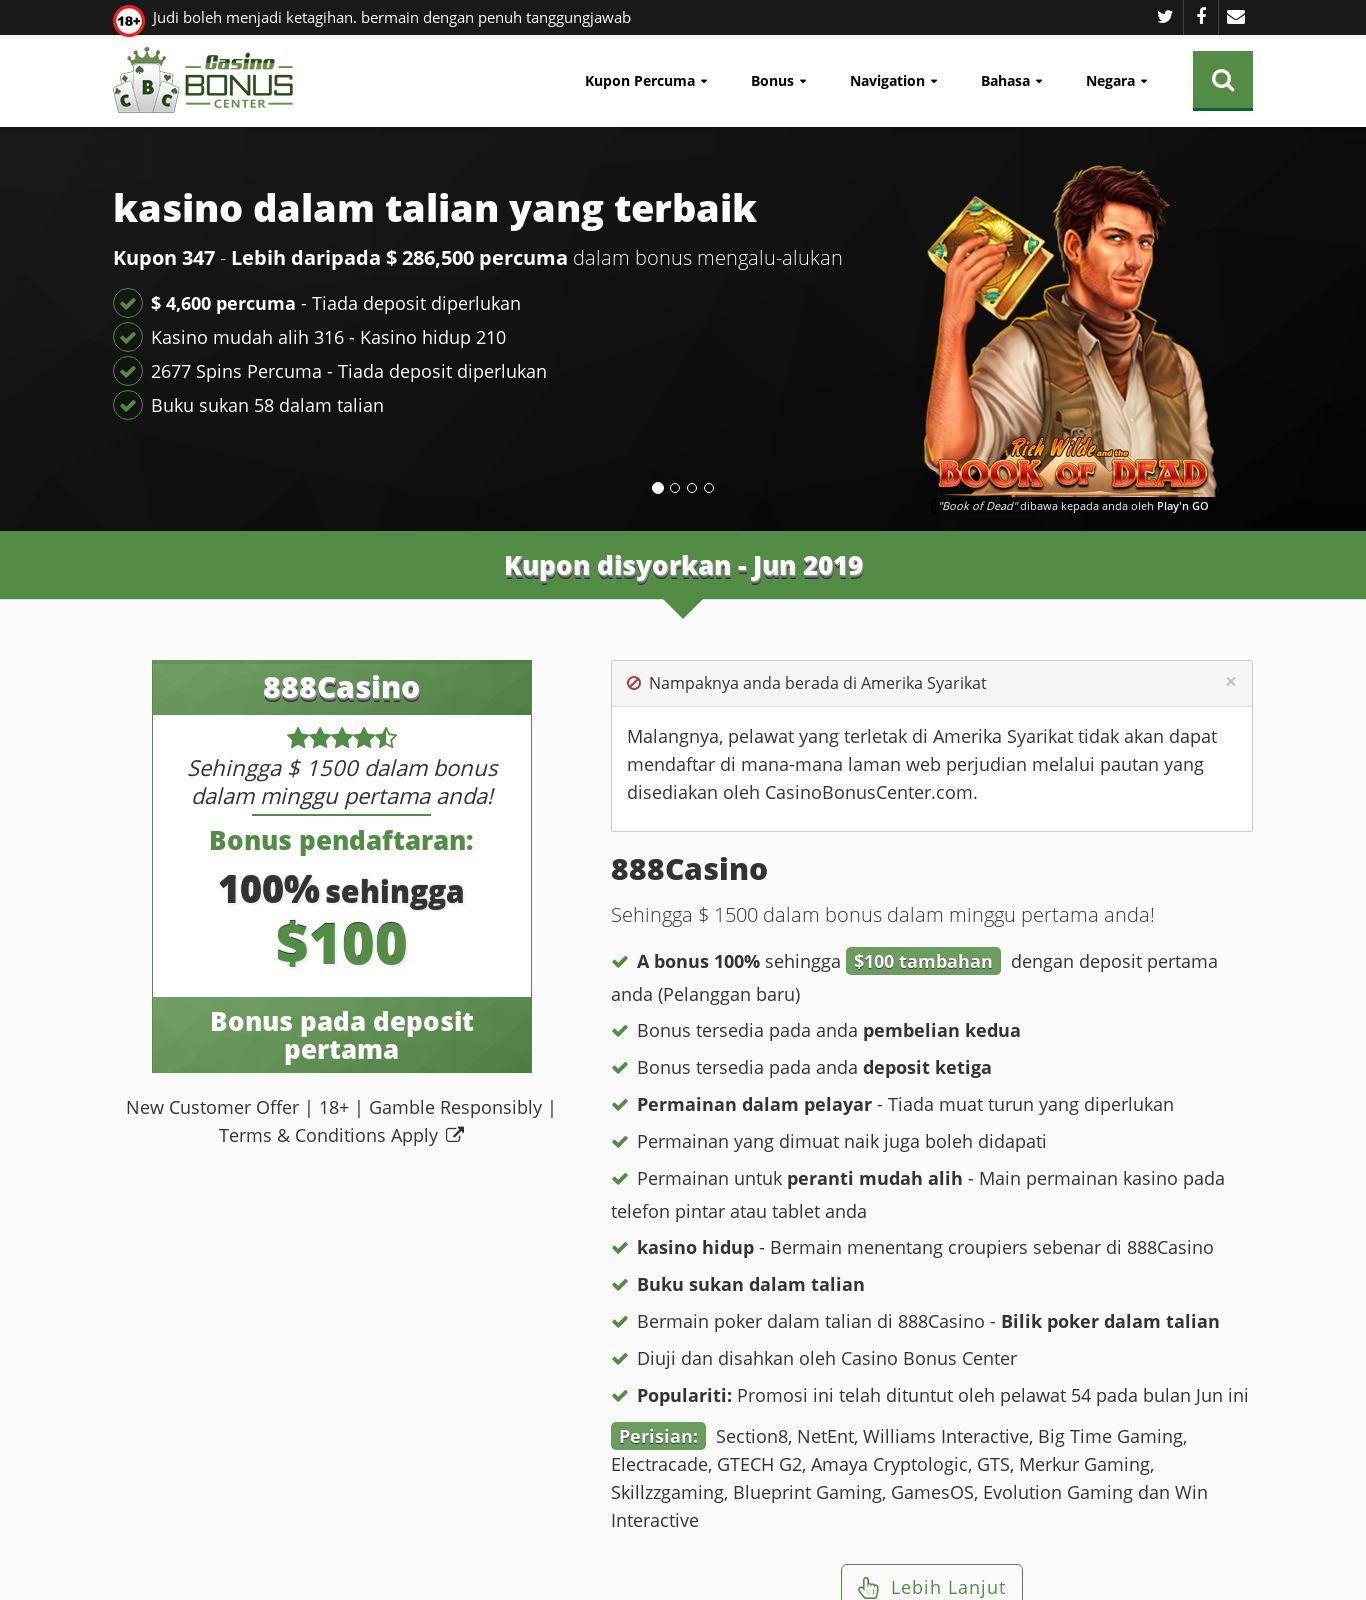 Klaver casino mobilen bovada website abgestürzt